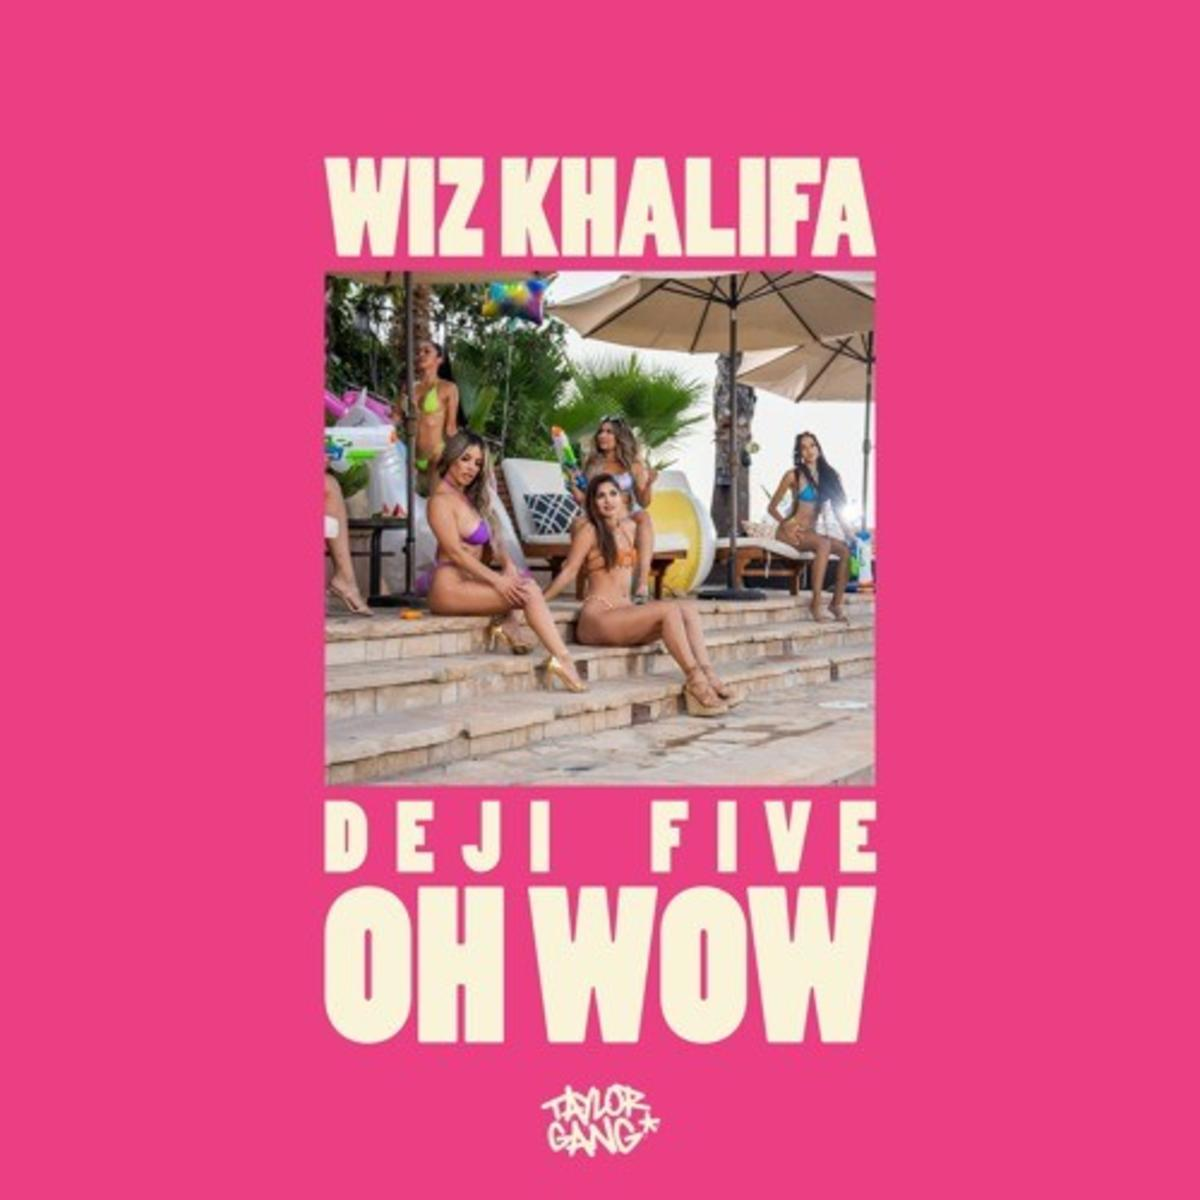 Taylor Gang Ft. Wiz Khalifa, Young Deji & Feezy - Oh Wow Mp3